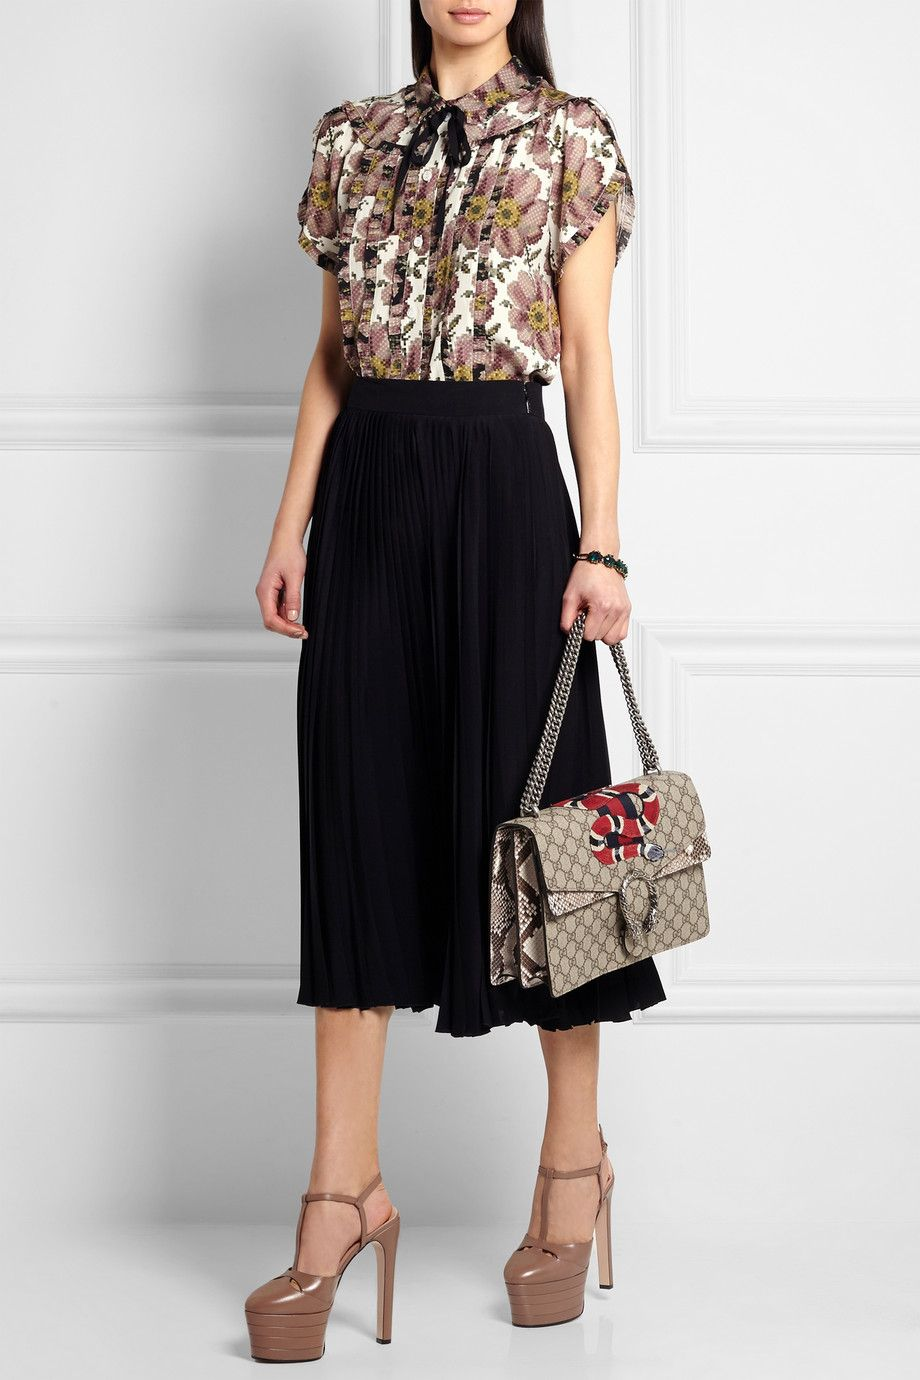 Gucci | Dionysus medium appliquéd coated canvas and python shoulder bag | NET-A-PORTER.COM